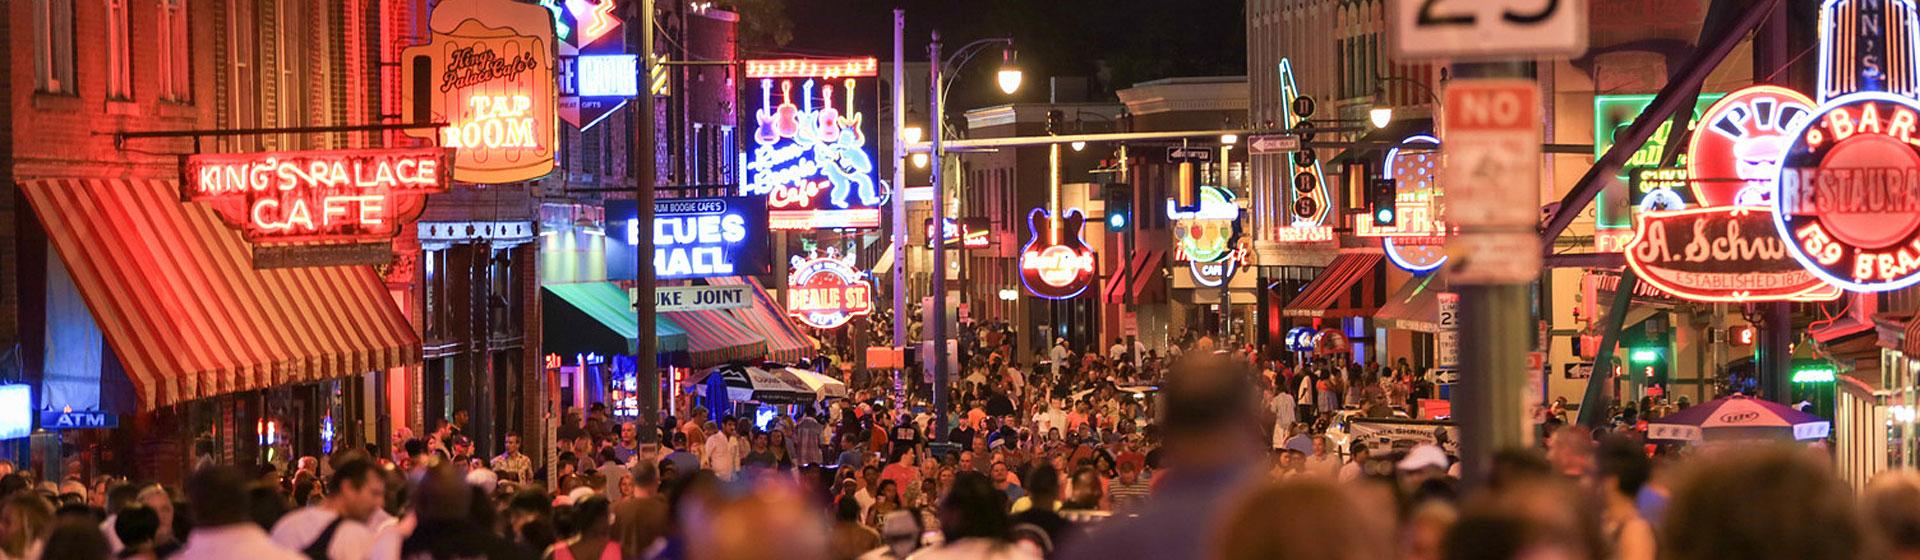 Beale Street i Memphis, Tennessee.